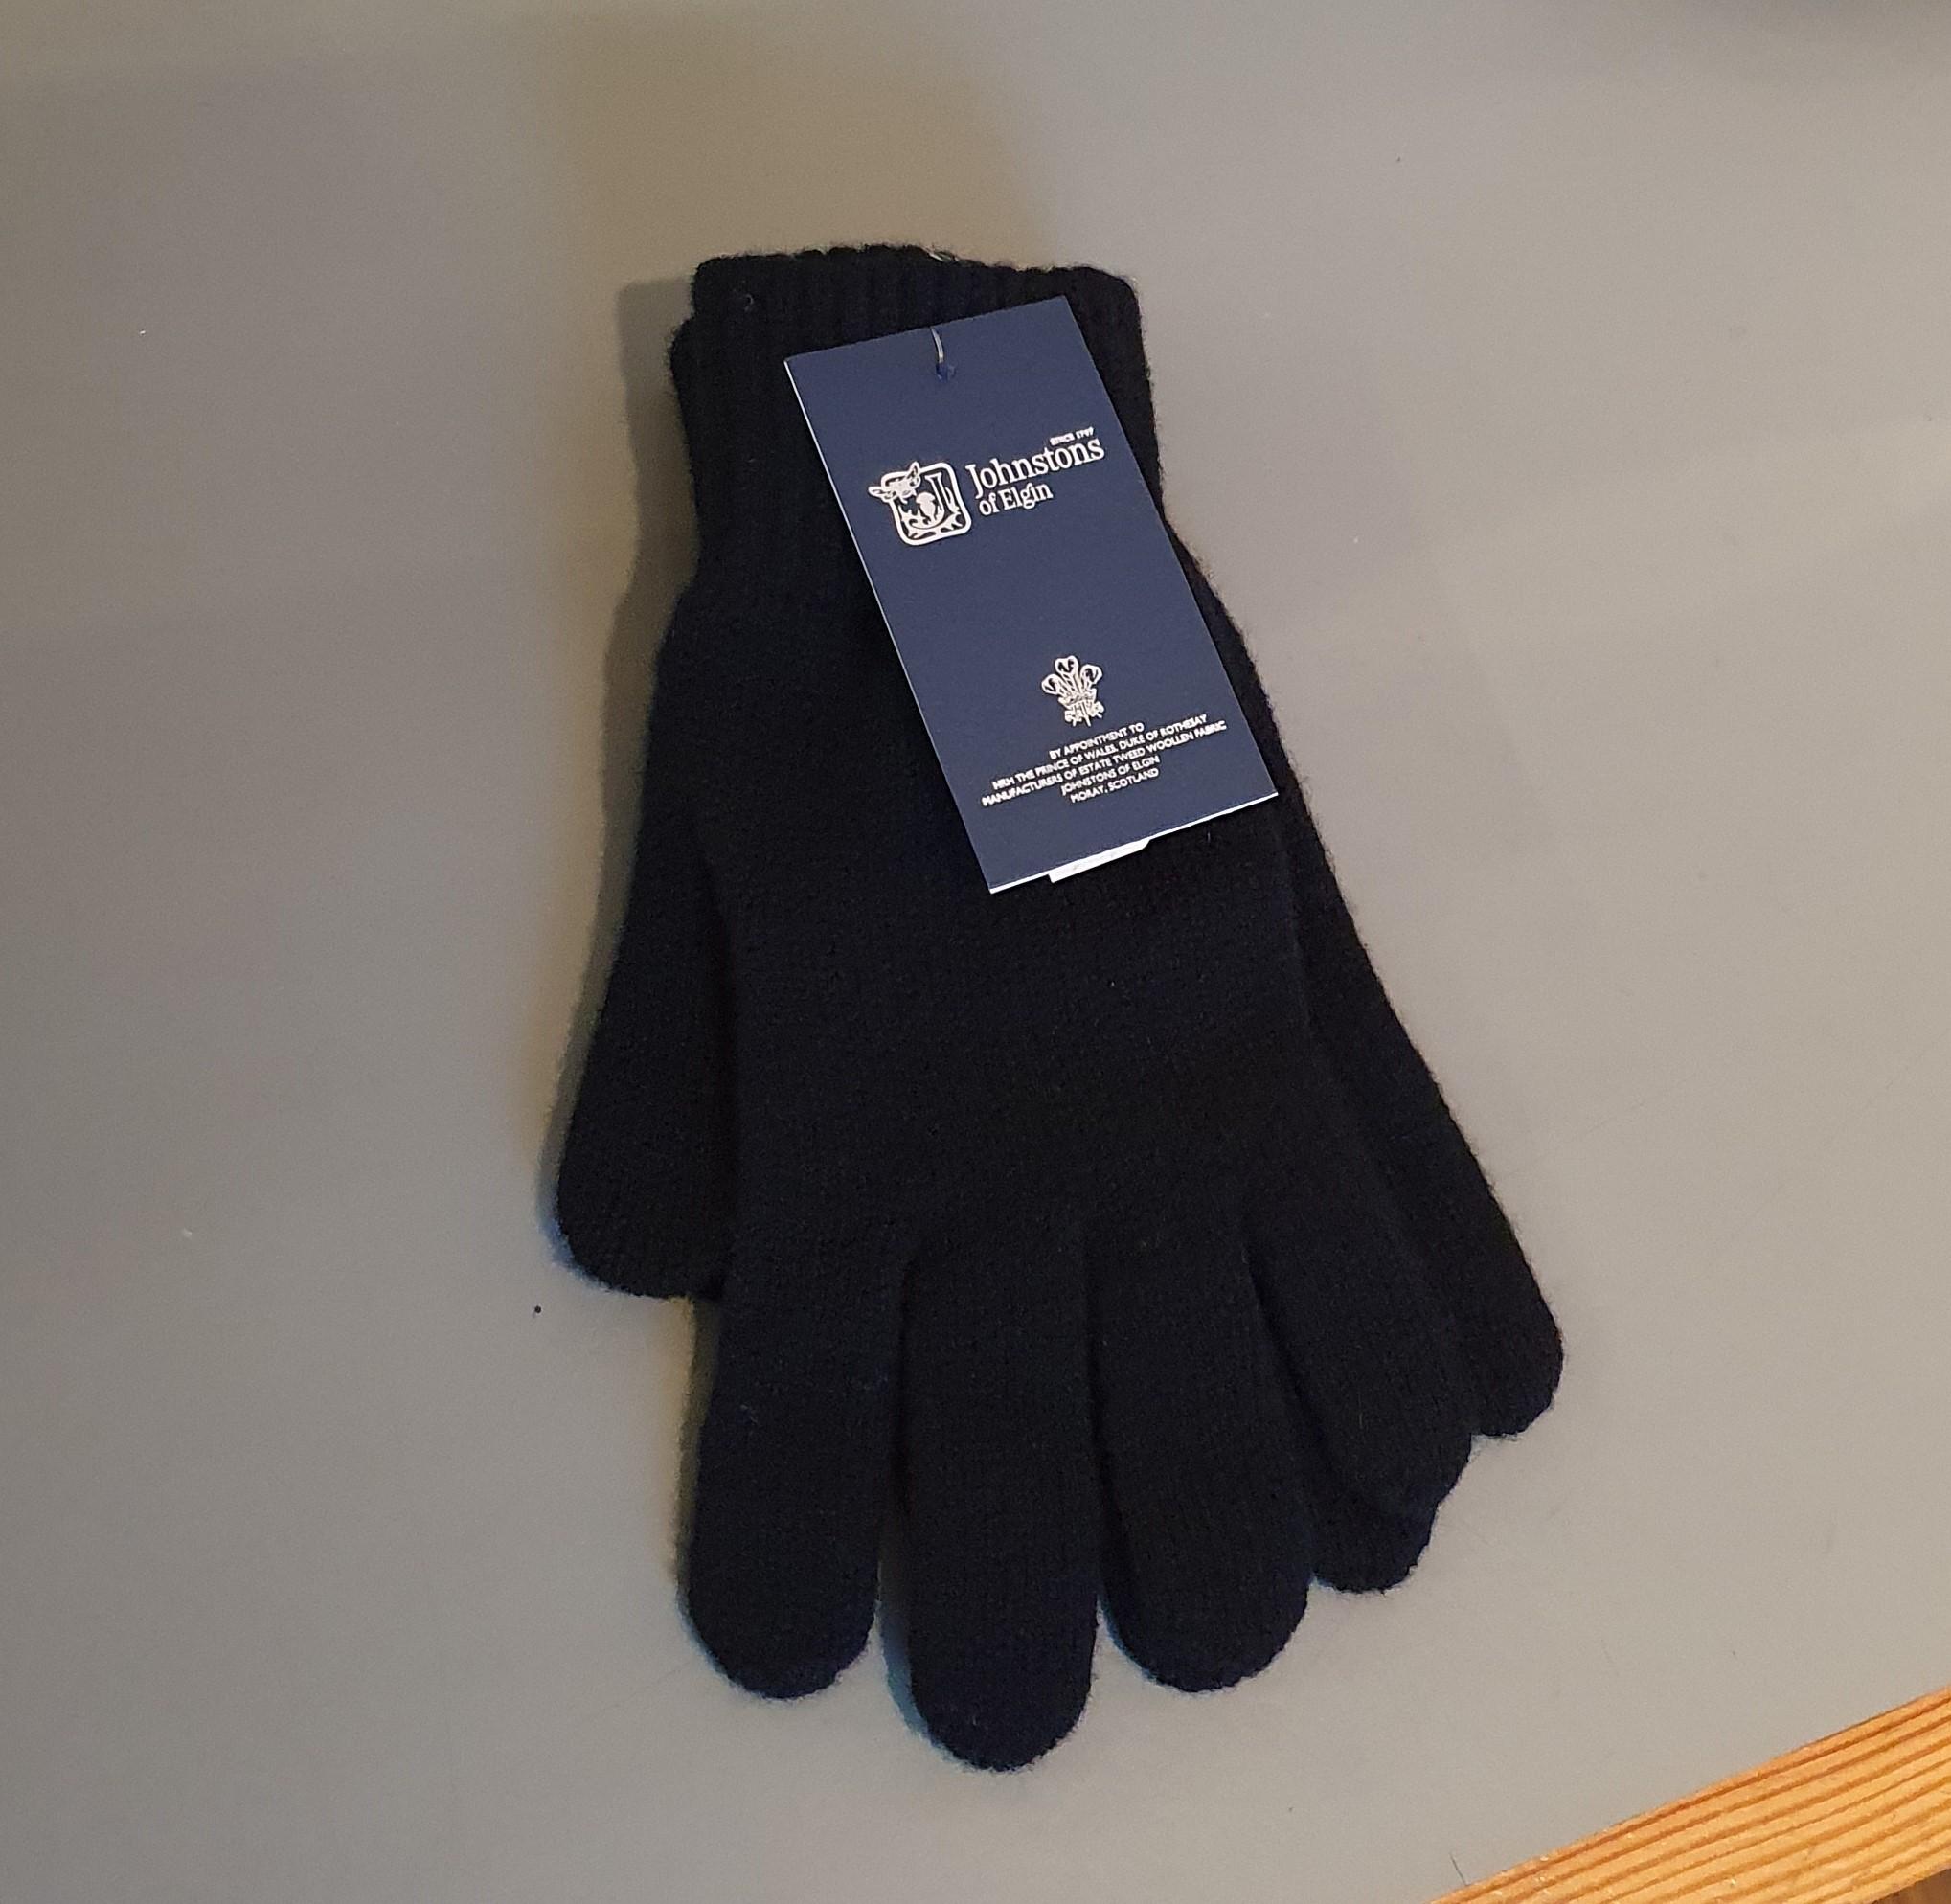 100% Lambswool Gloves - Black